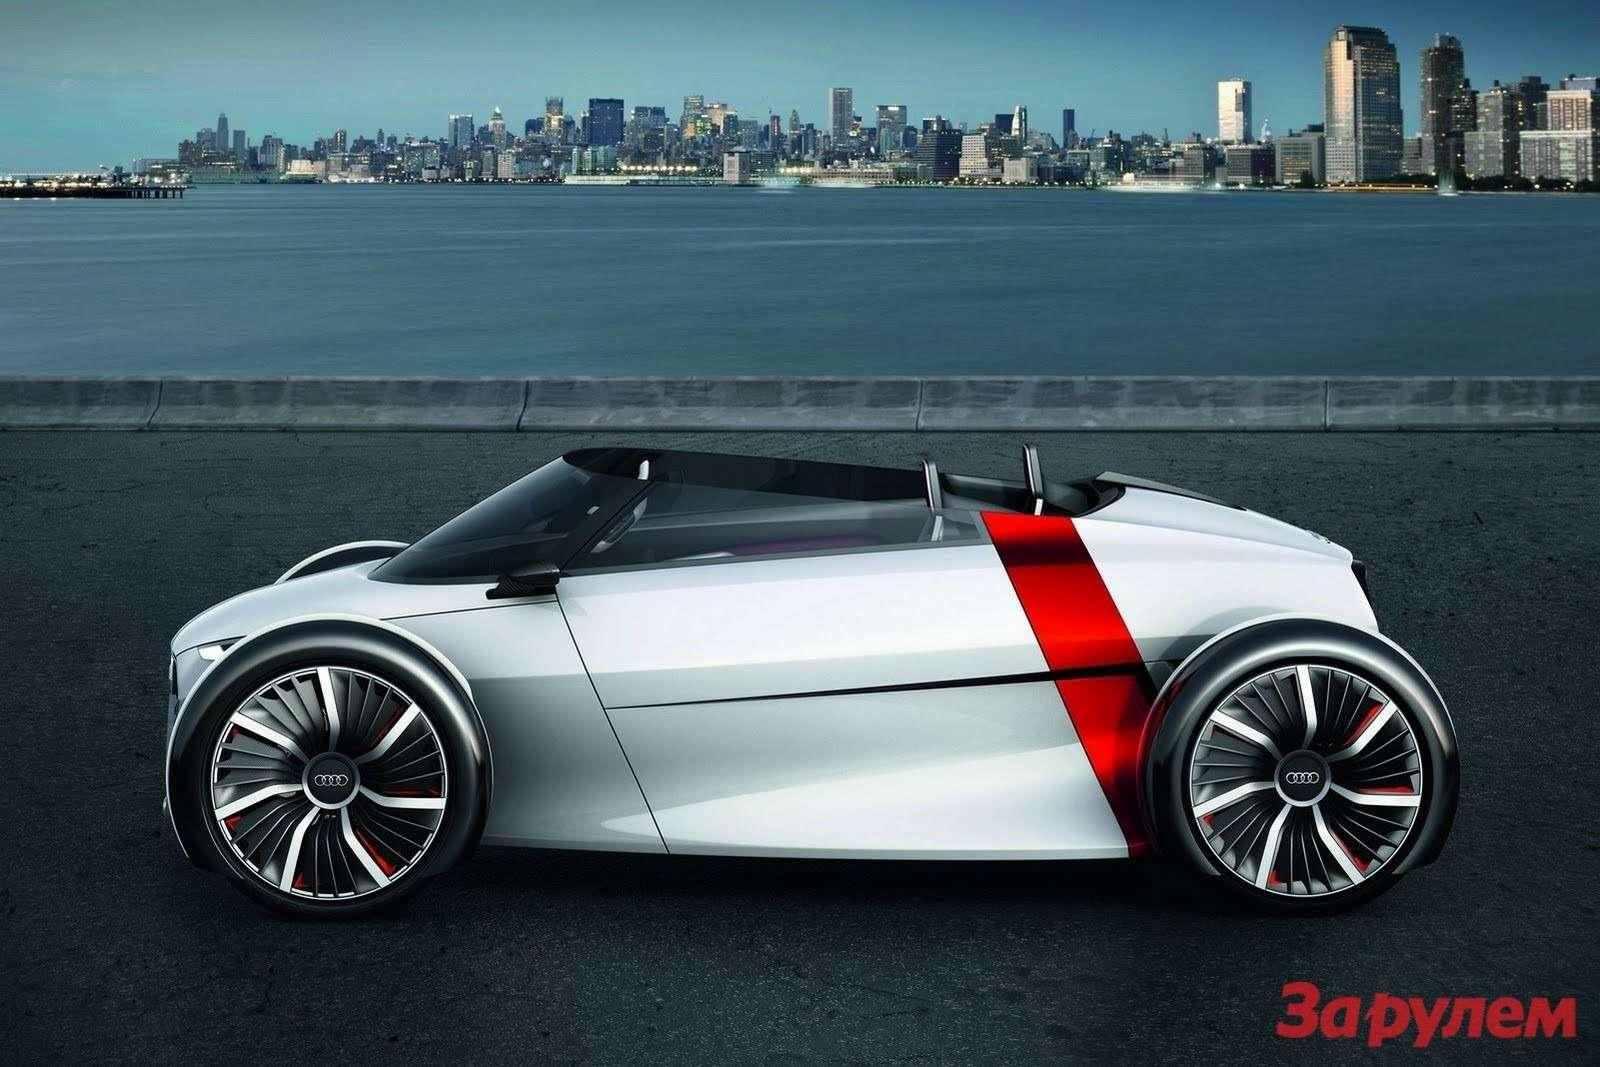 Audi-Urban-13